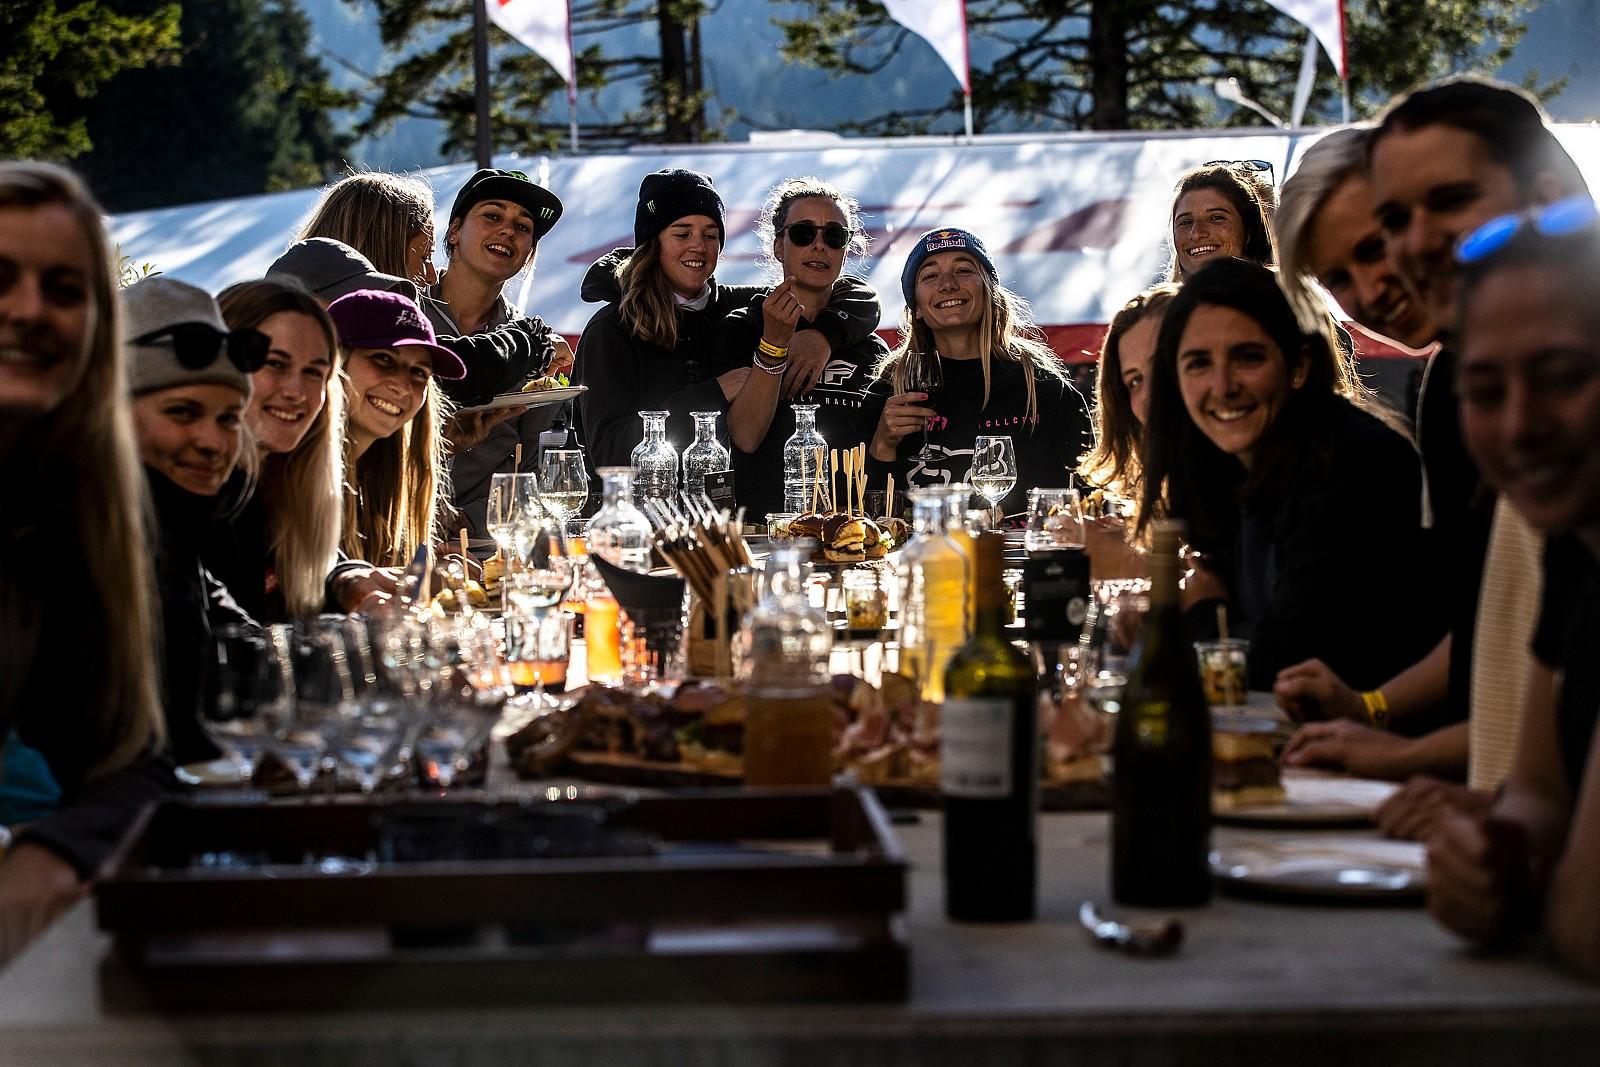 Women of World Cup Downhill - PIT BITS 2 - Lenzerheide World Cup DH - Mountain Biking Pictures - Vital MTB